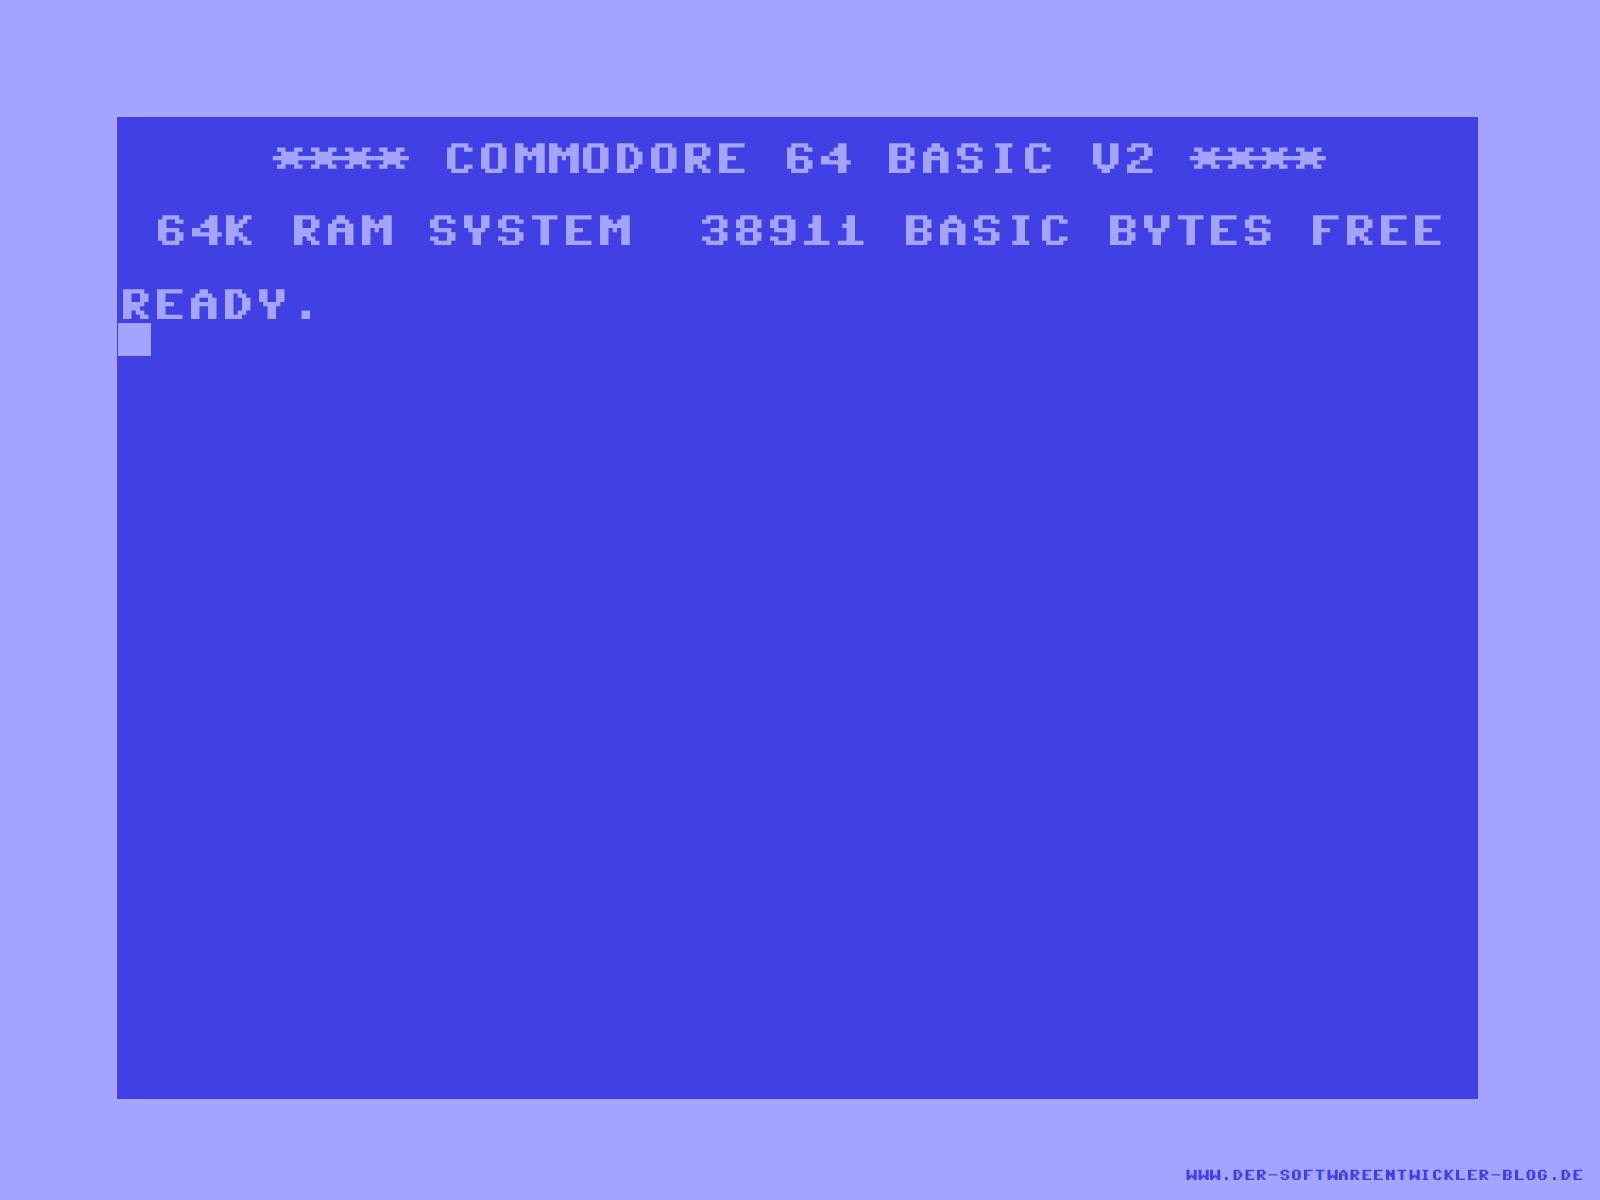 Retro C64 wallpapers Retro C64 stock photos 1600x1200